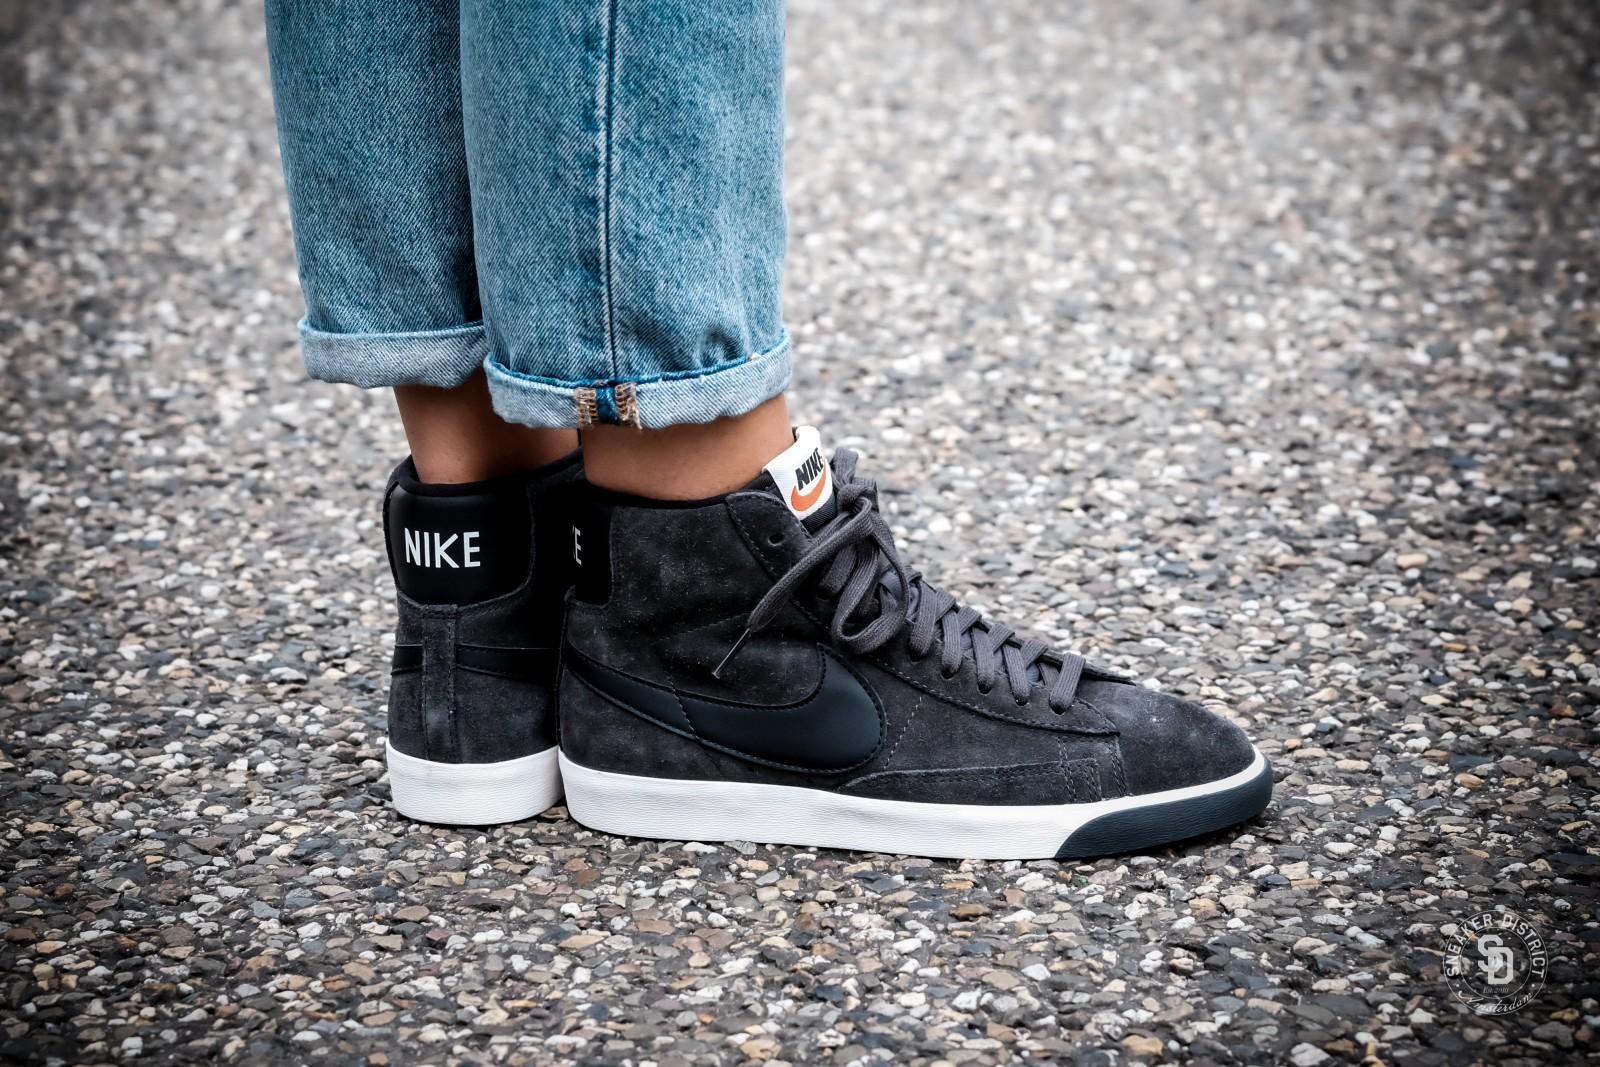 Convencional secretamente Capitán Brie  Nike Women's Blazer Mid Suede Vintage Anthracite/Black-Gum - 917862-003